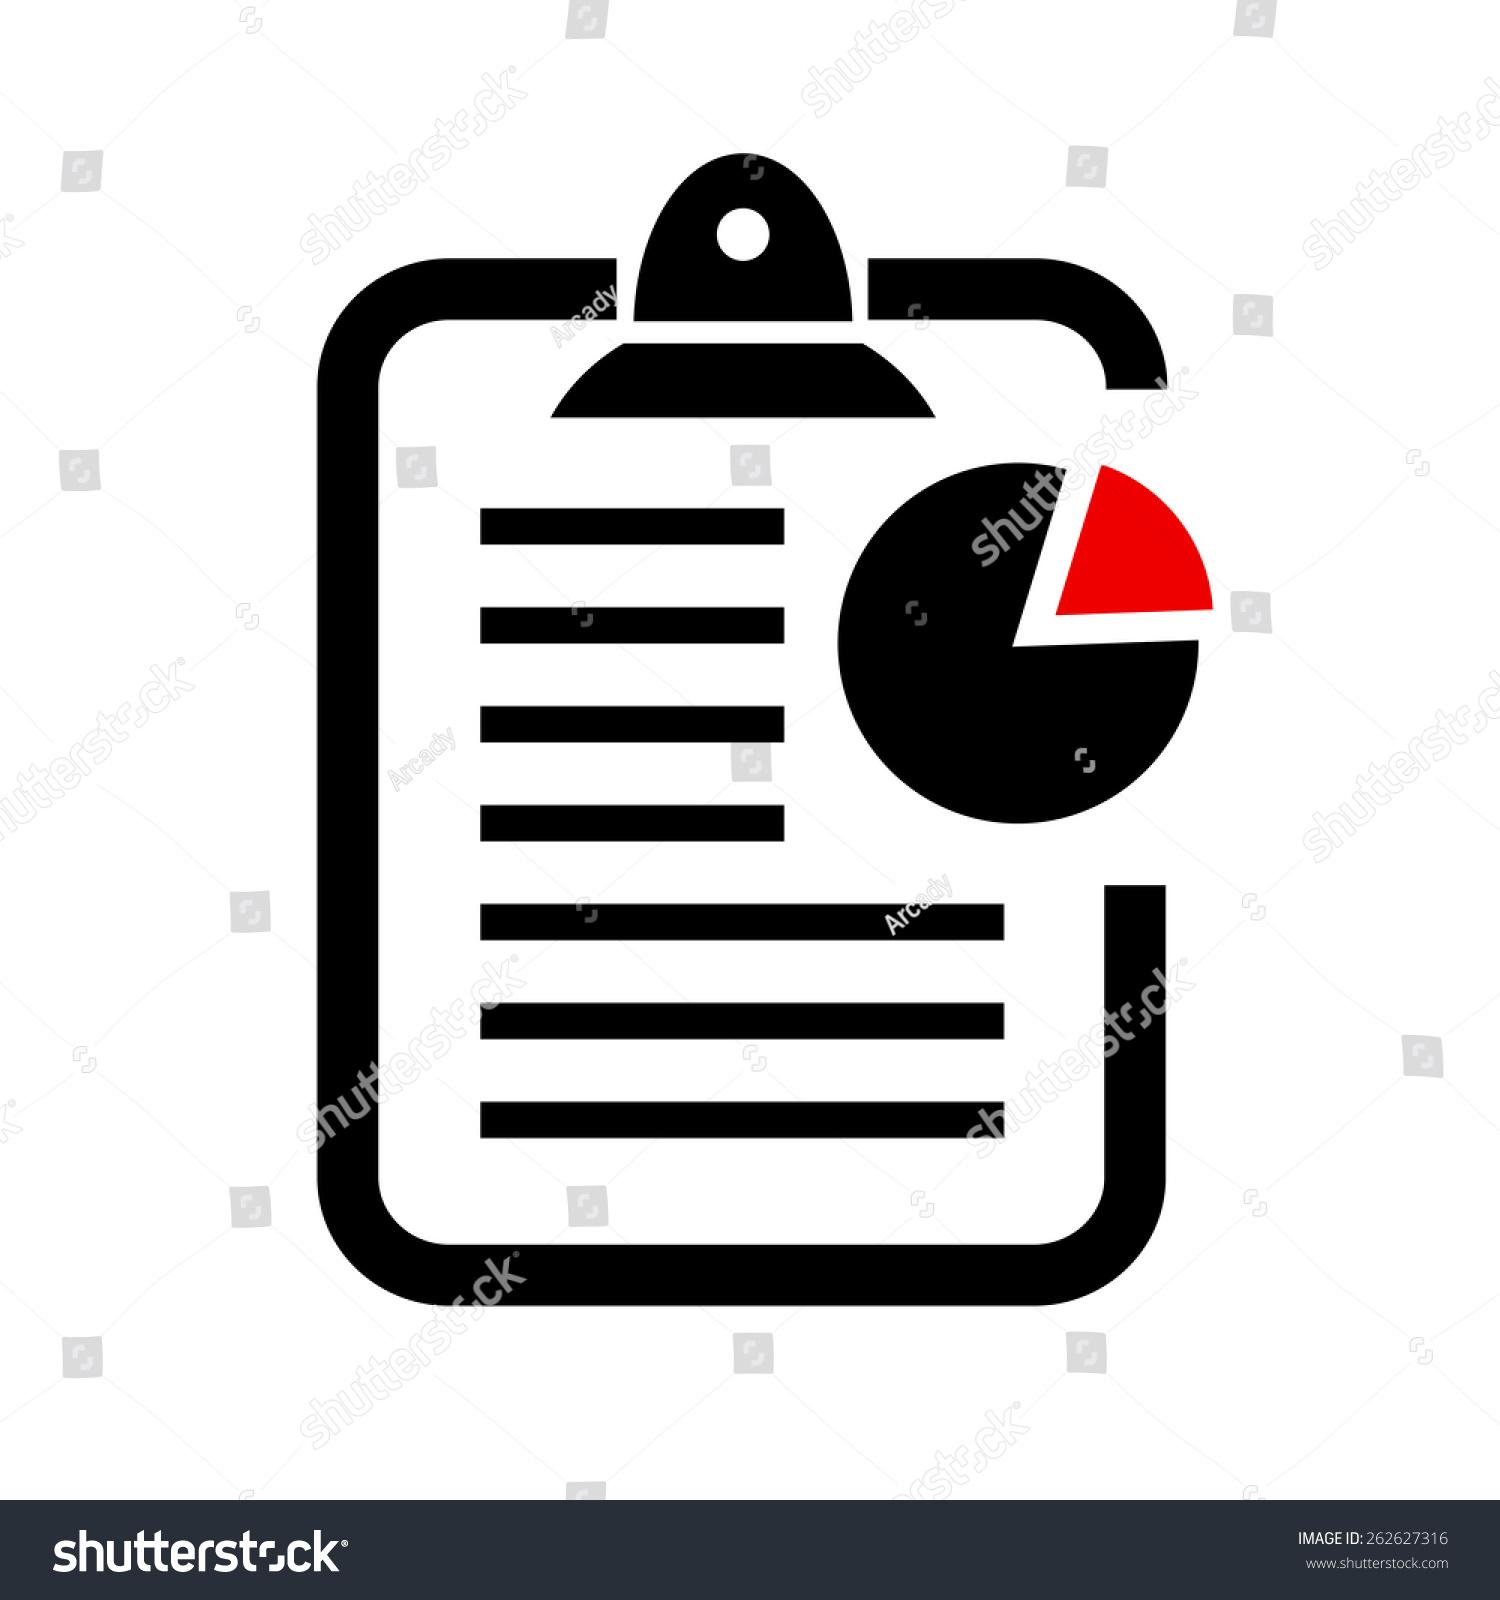 Report Vector Icon - 262627316 : Shutterstock